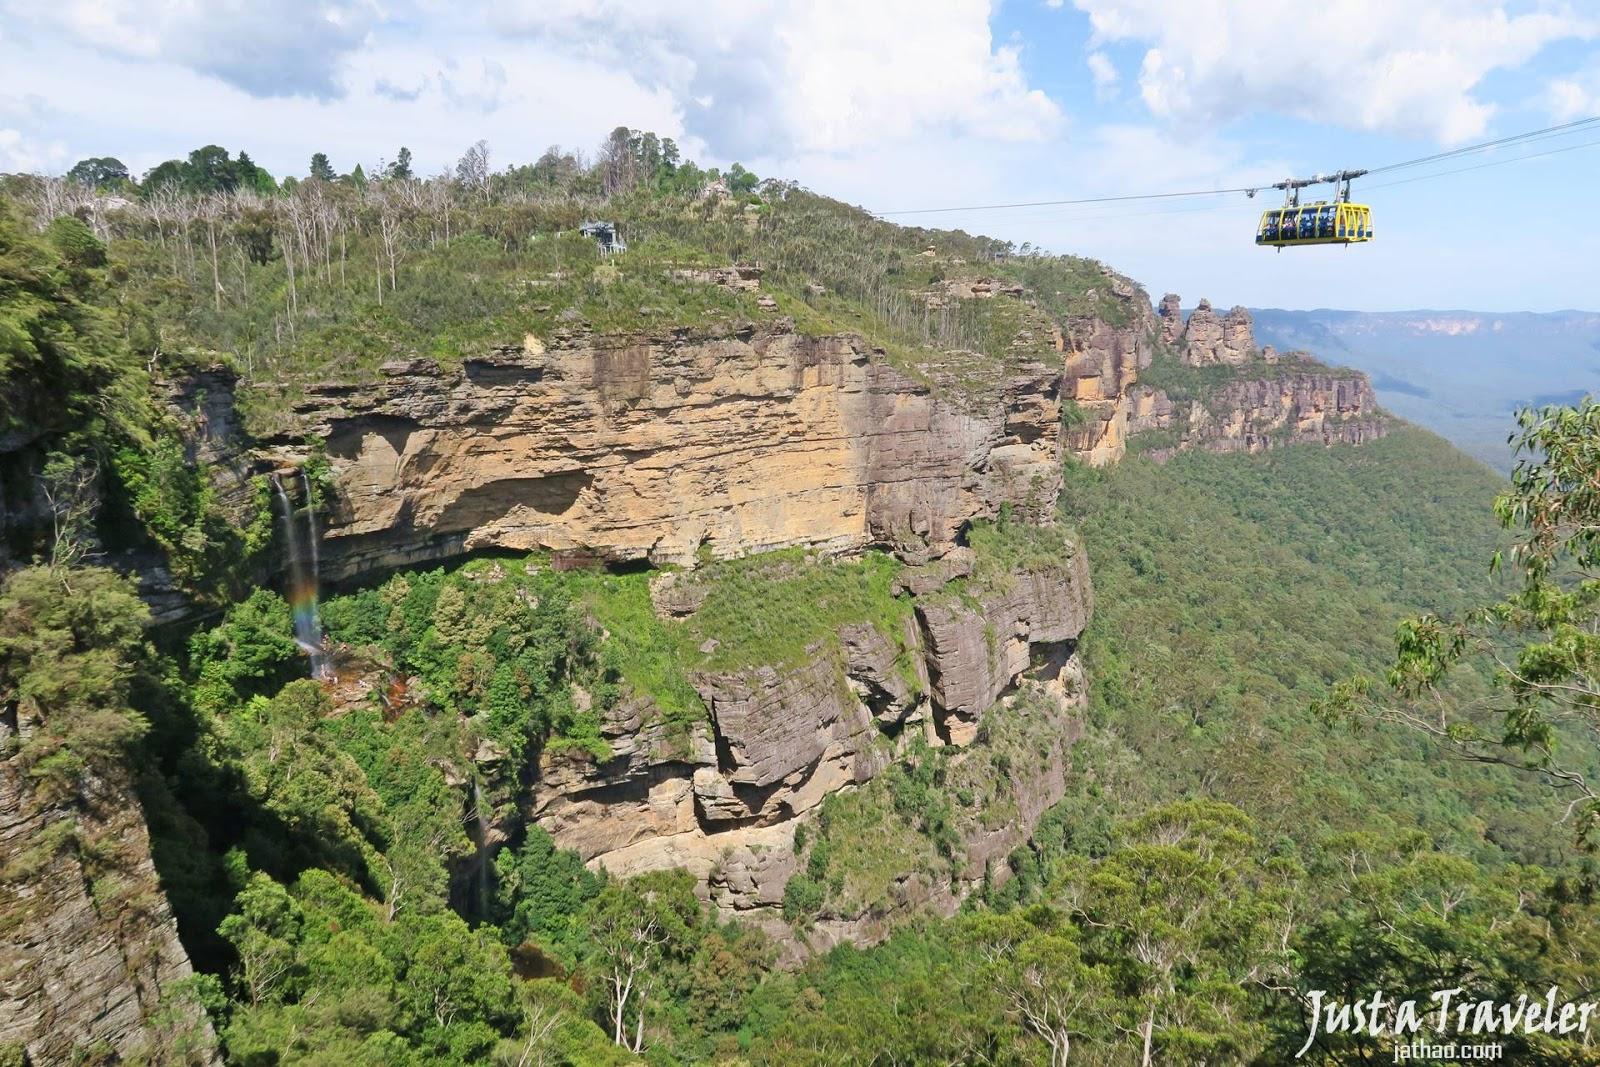 雪梨-景點-藍山-景觀世界-Skyway-澳洲-Sydney-Blue-Mountain-Scenic-World-Tourist-Attraction-Australia